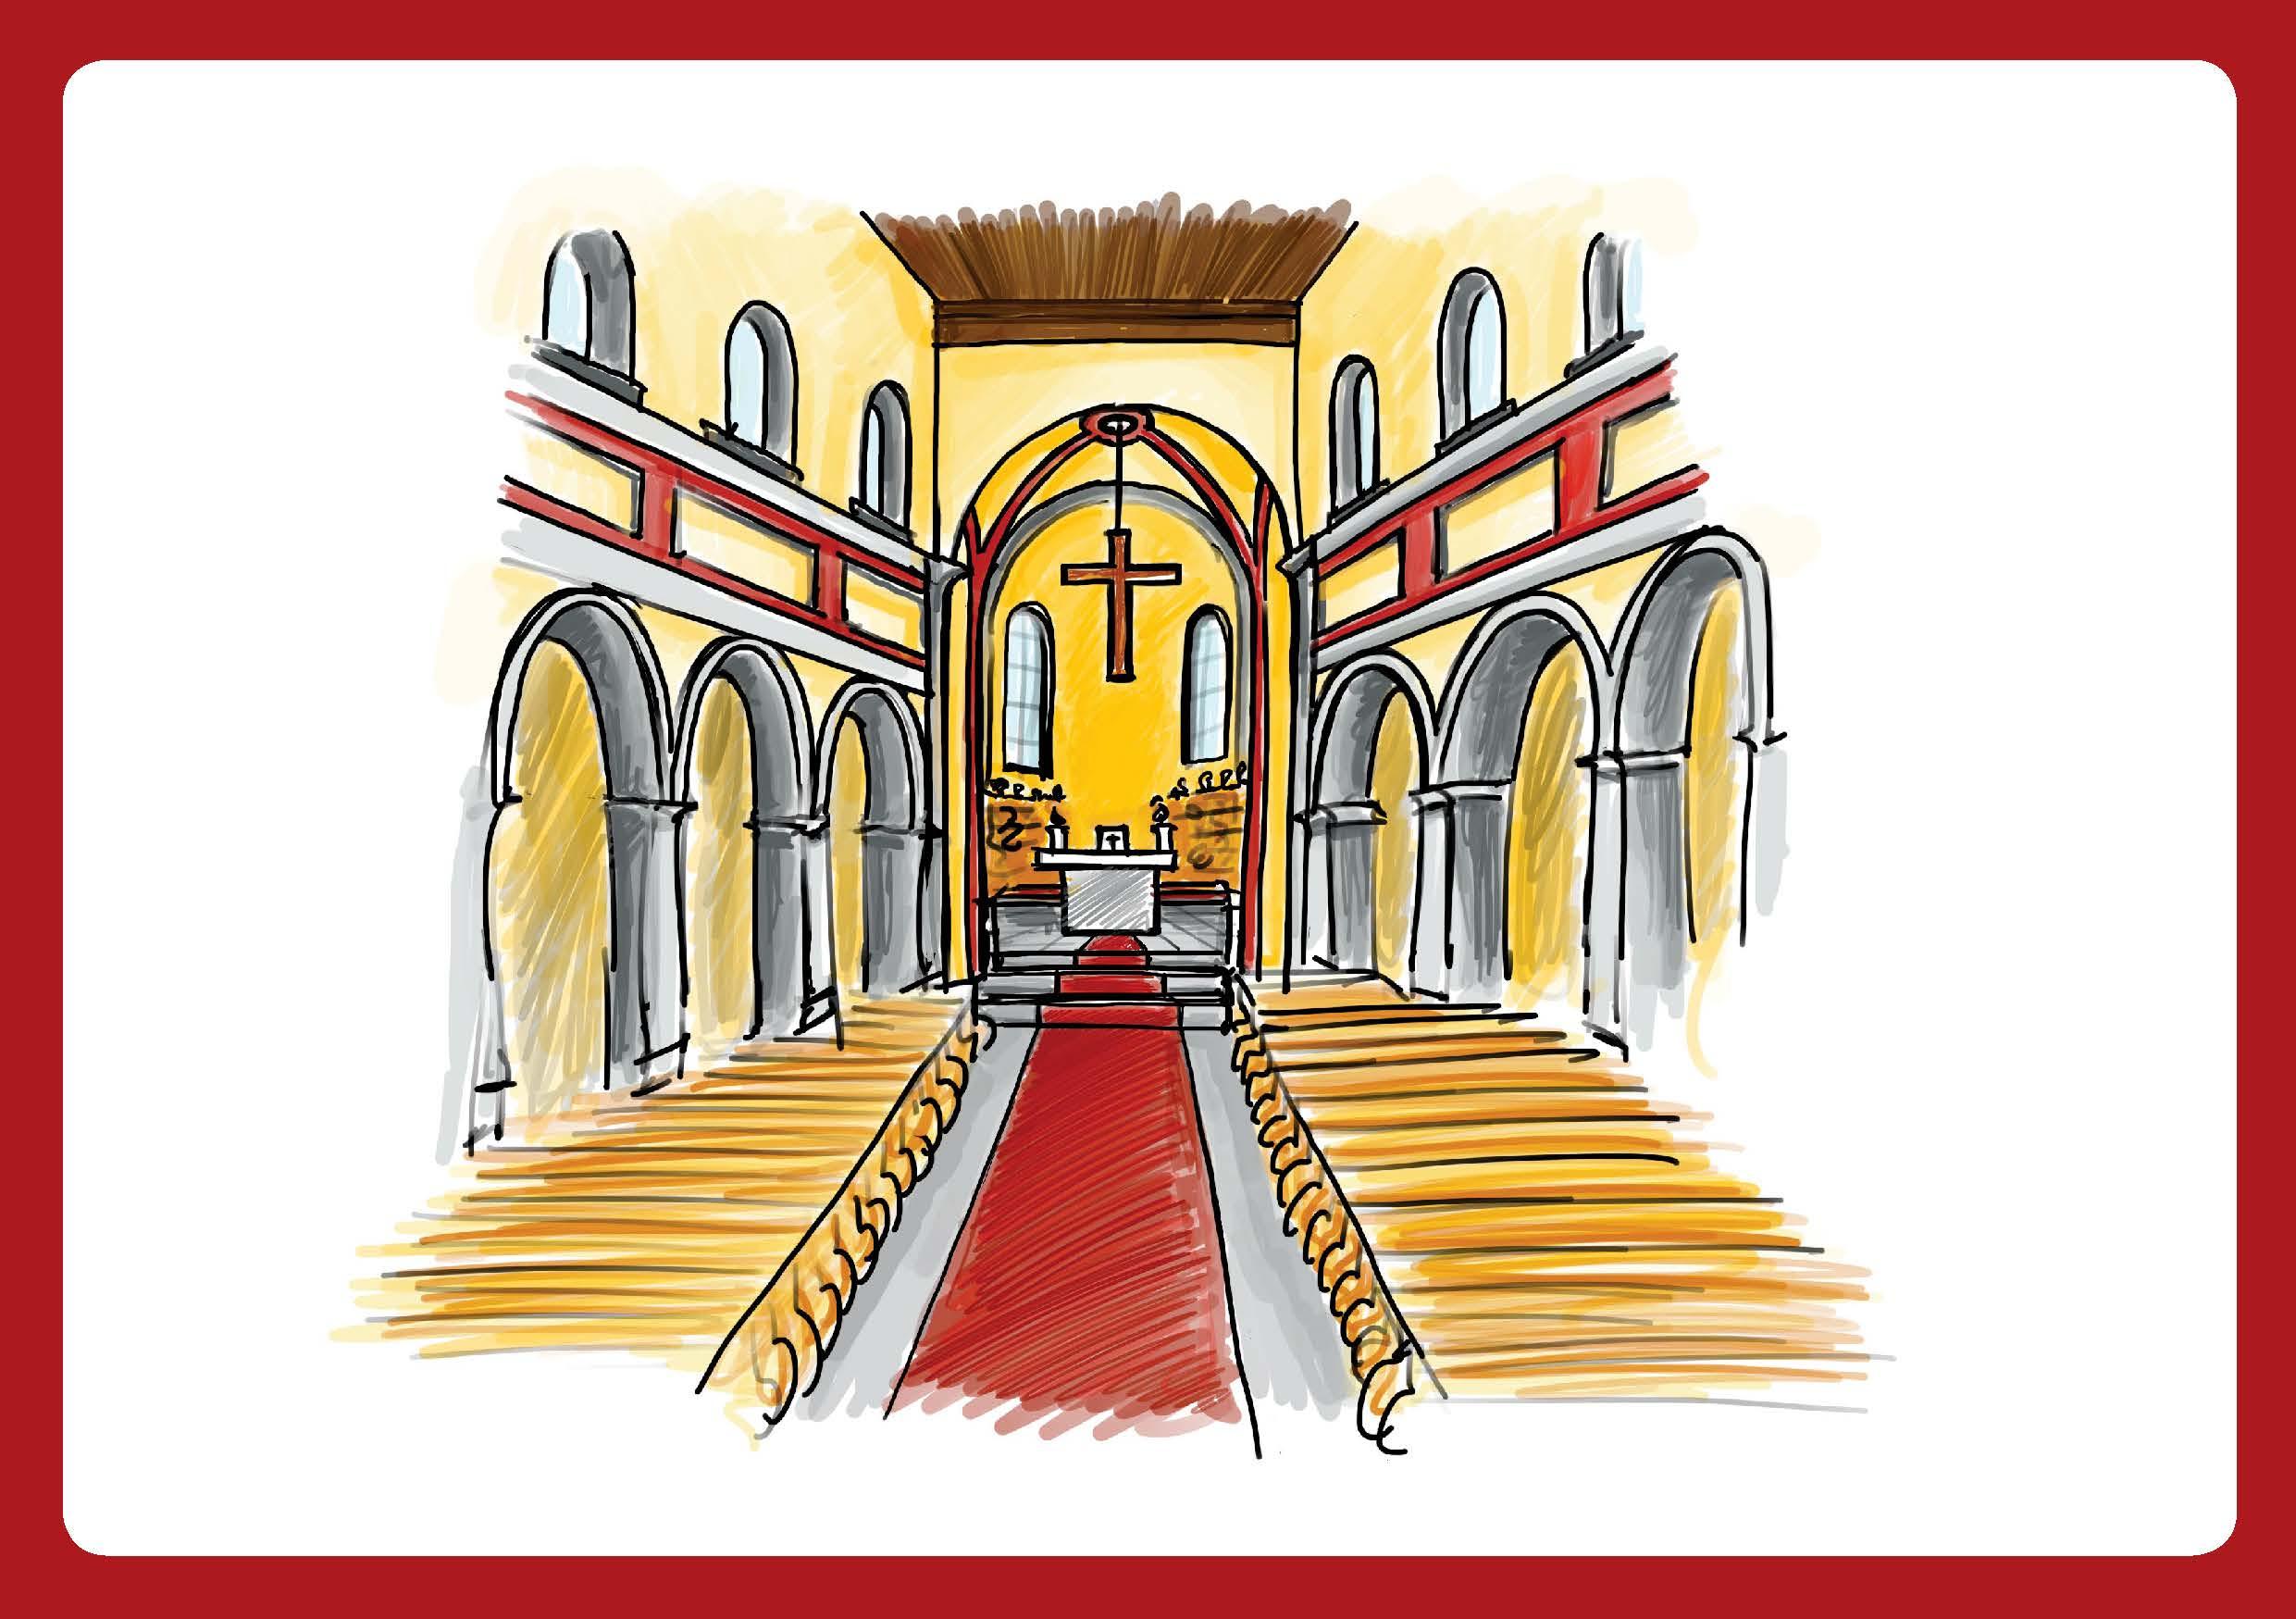 Innenansicht zu Kinder entdecken den Kirchenraum